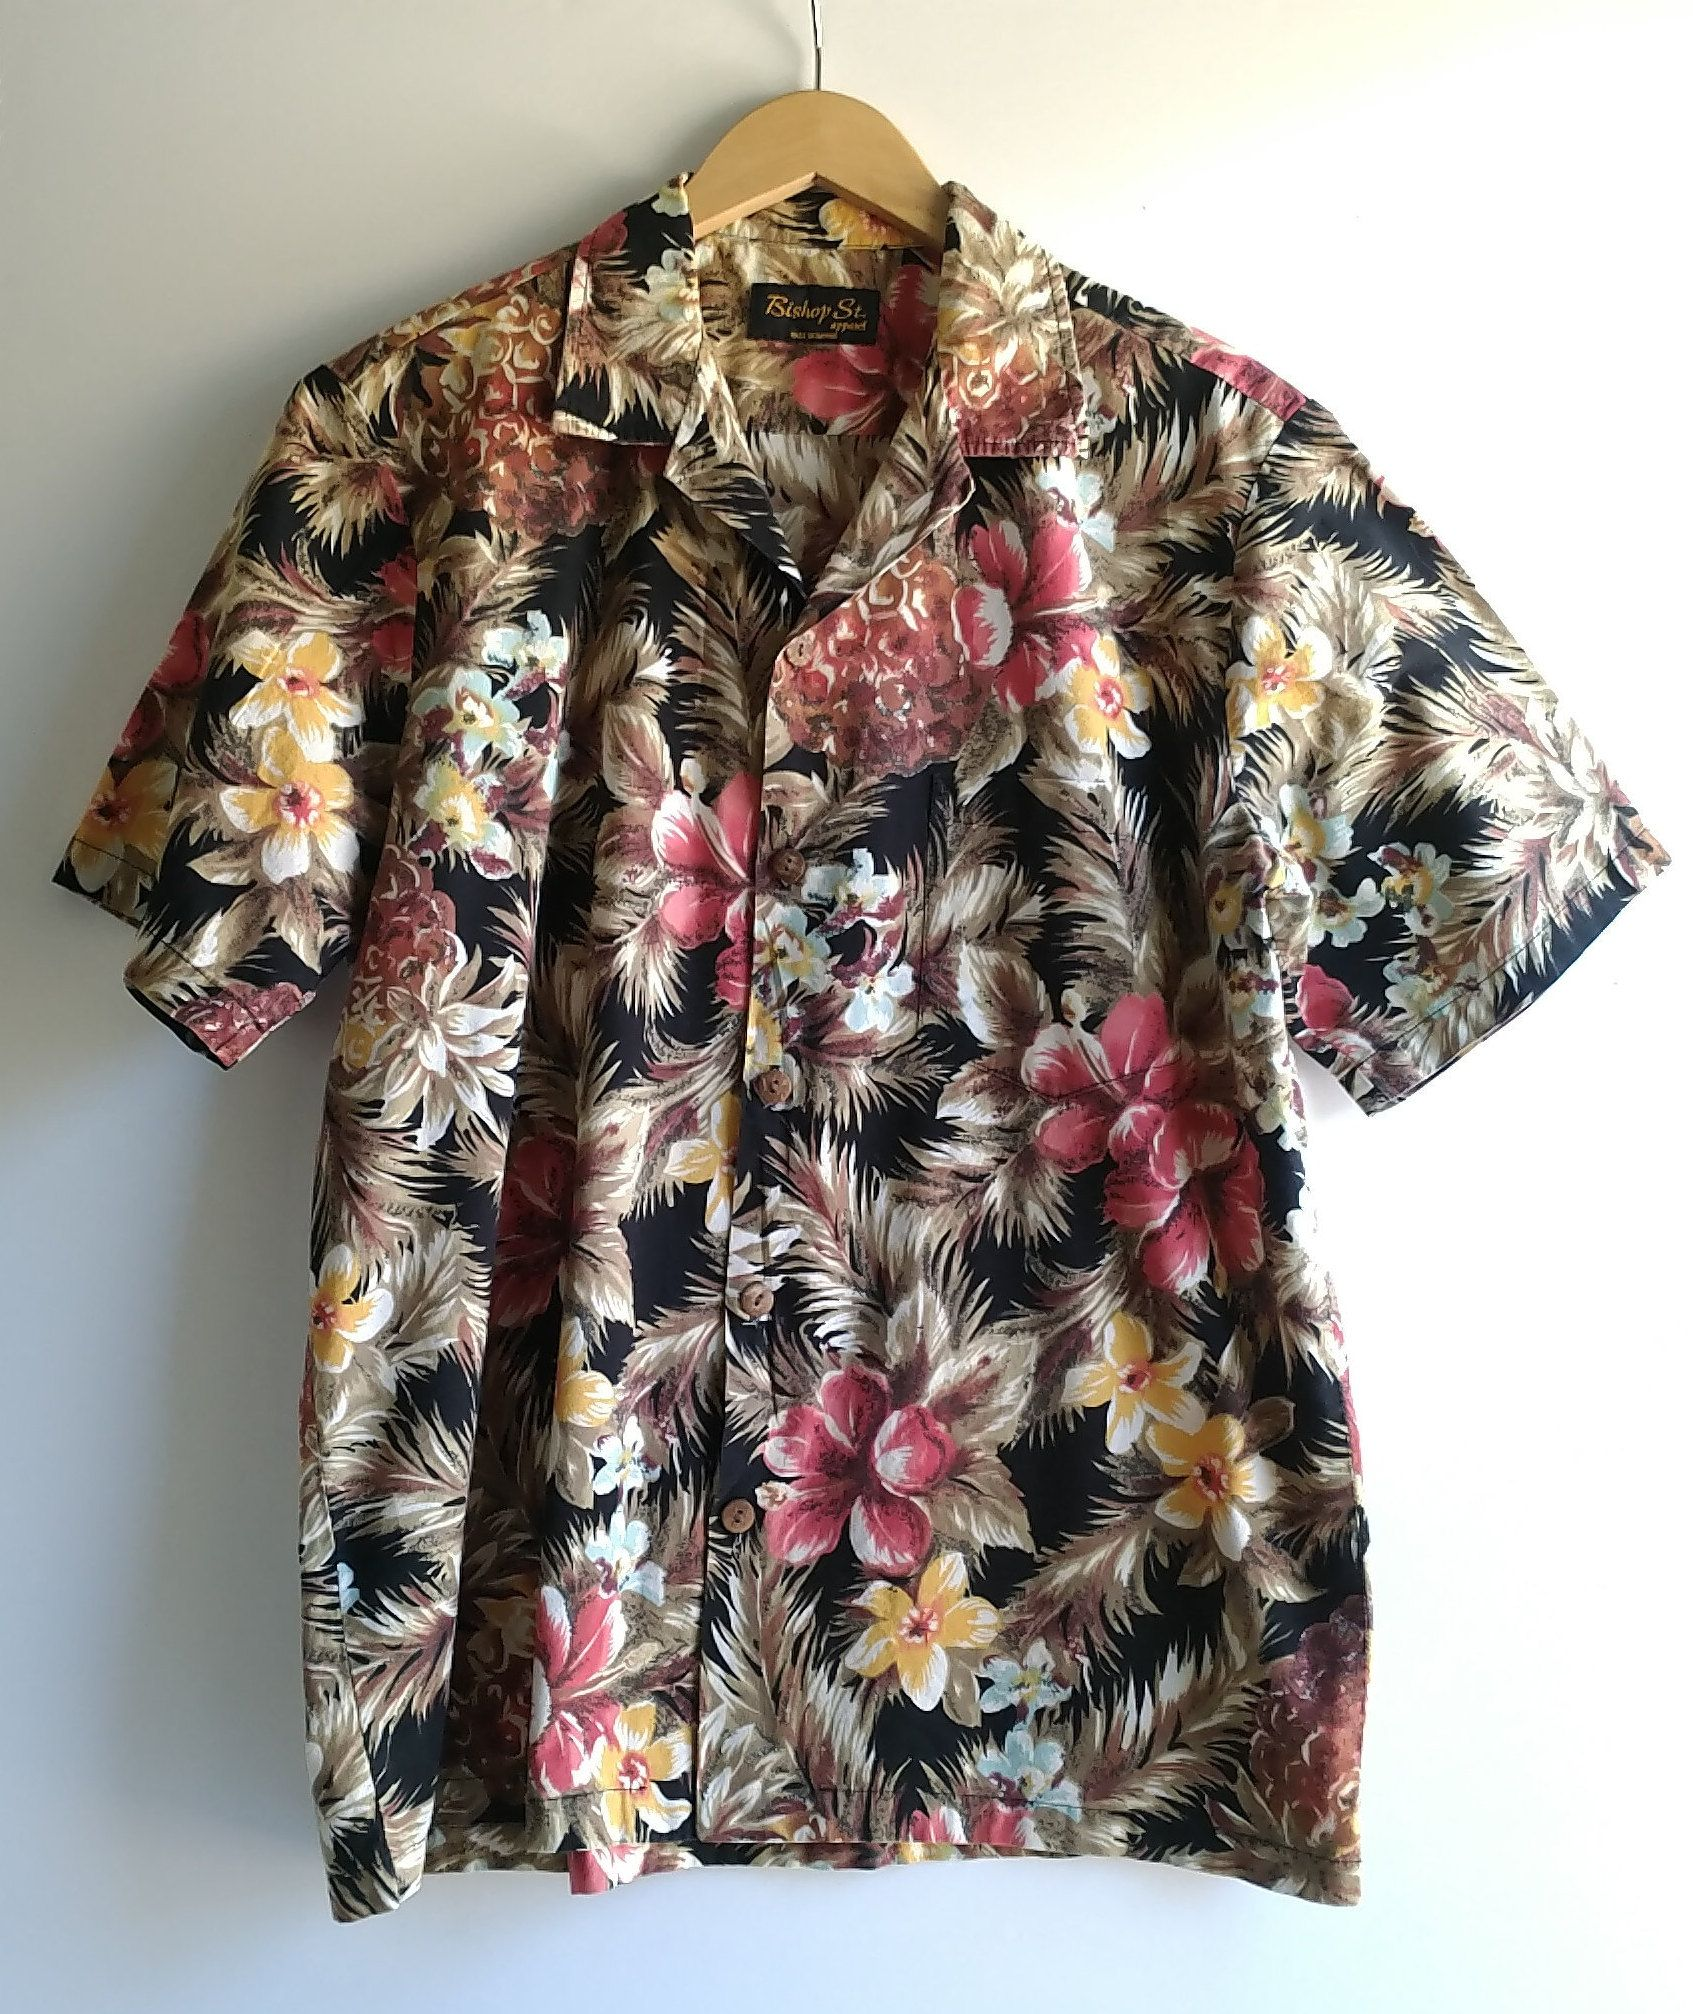 7f9179c9 Hawaiian Shirt VINTAGE BISHOP STREET Apparel Men's M Hawaiian Floral  Tropical Polynesian Print by RandomAmazing on Etsy